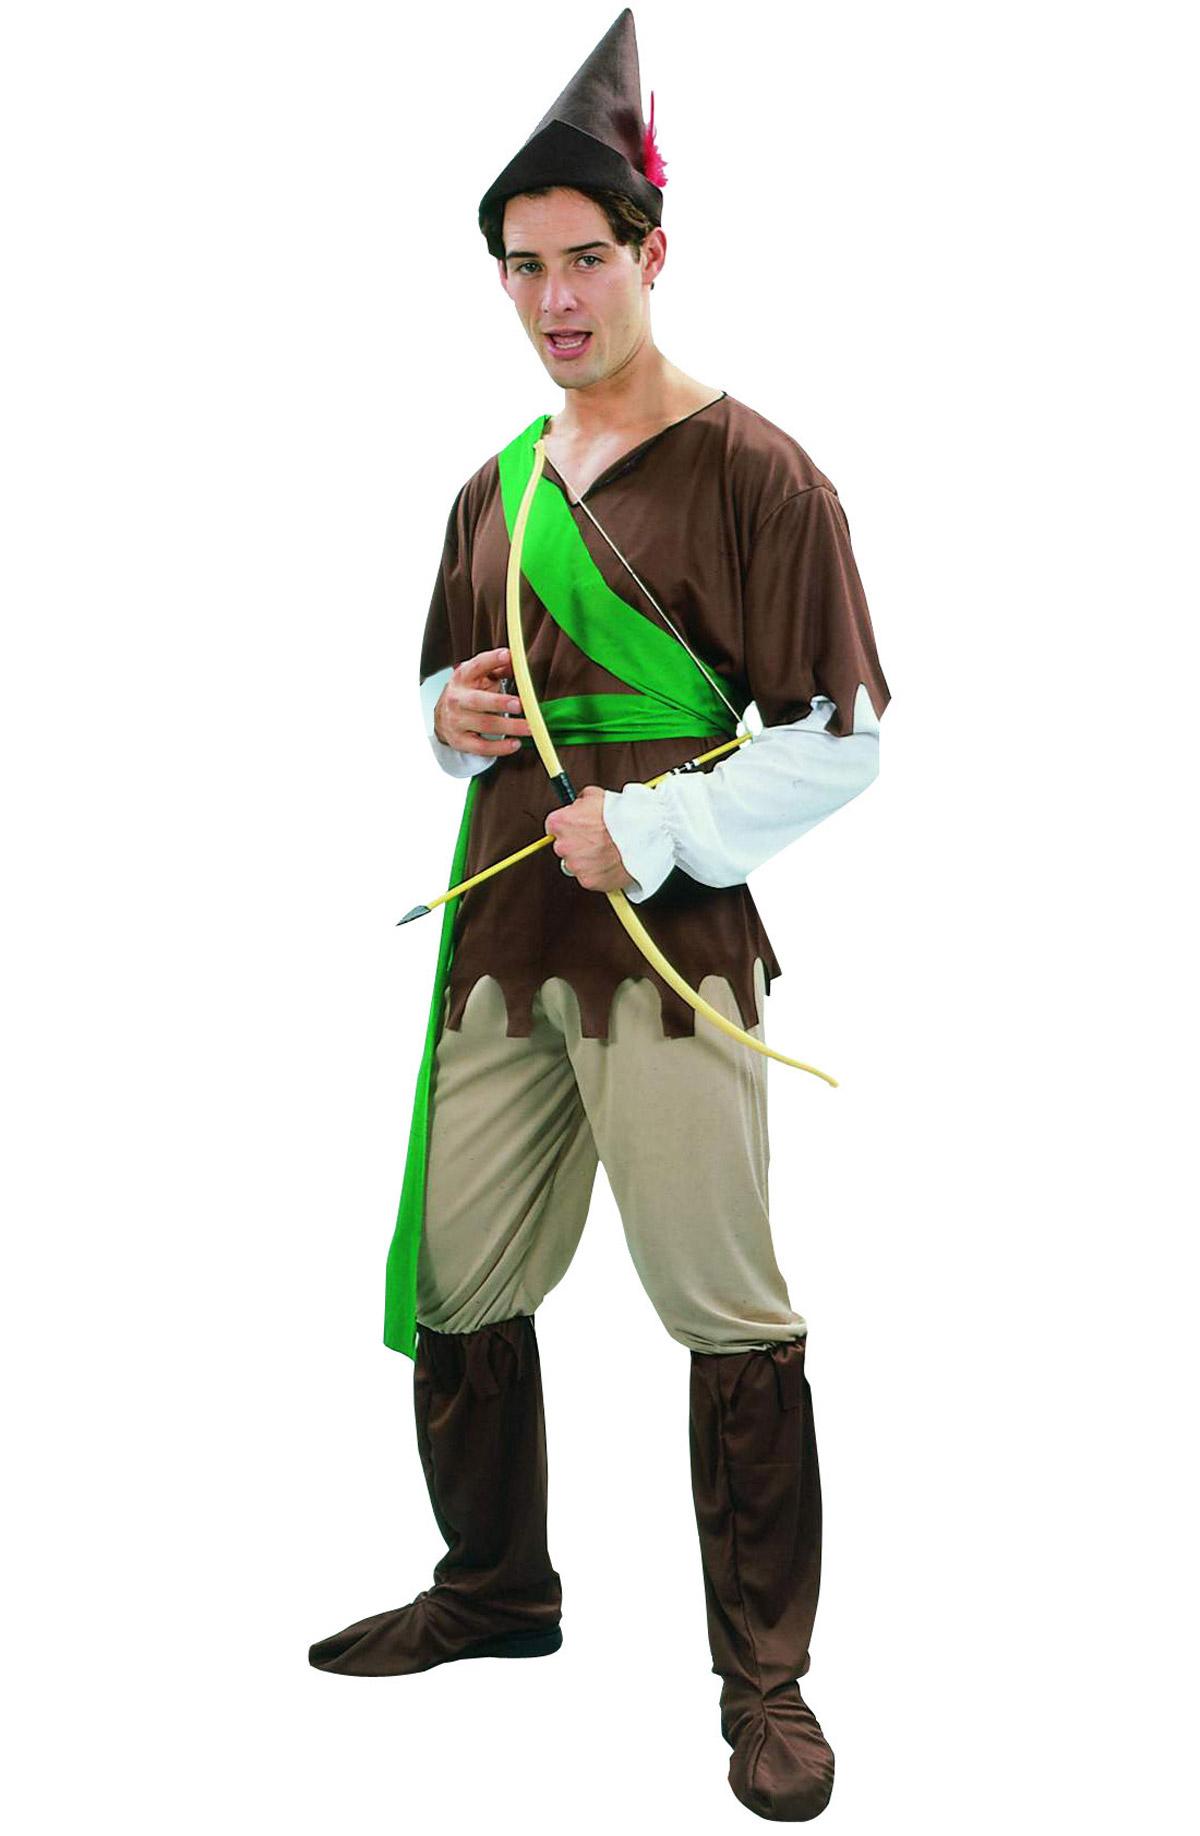 Lujo Sexy Disfraz Hombredisfraz Robin Hood Mujer 54RjLA